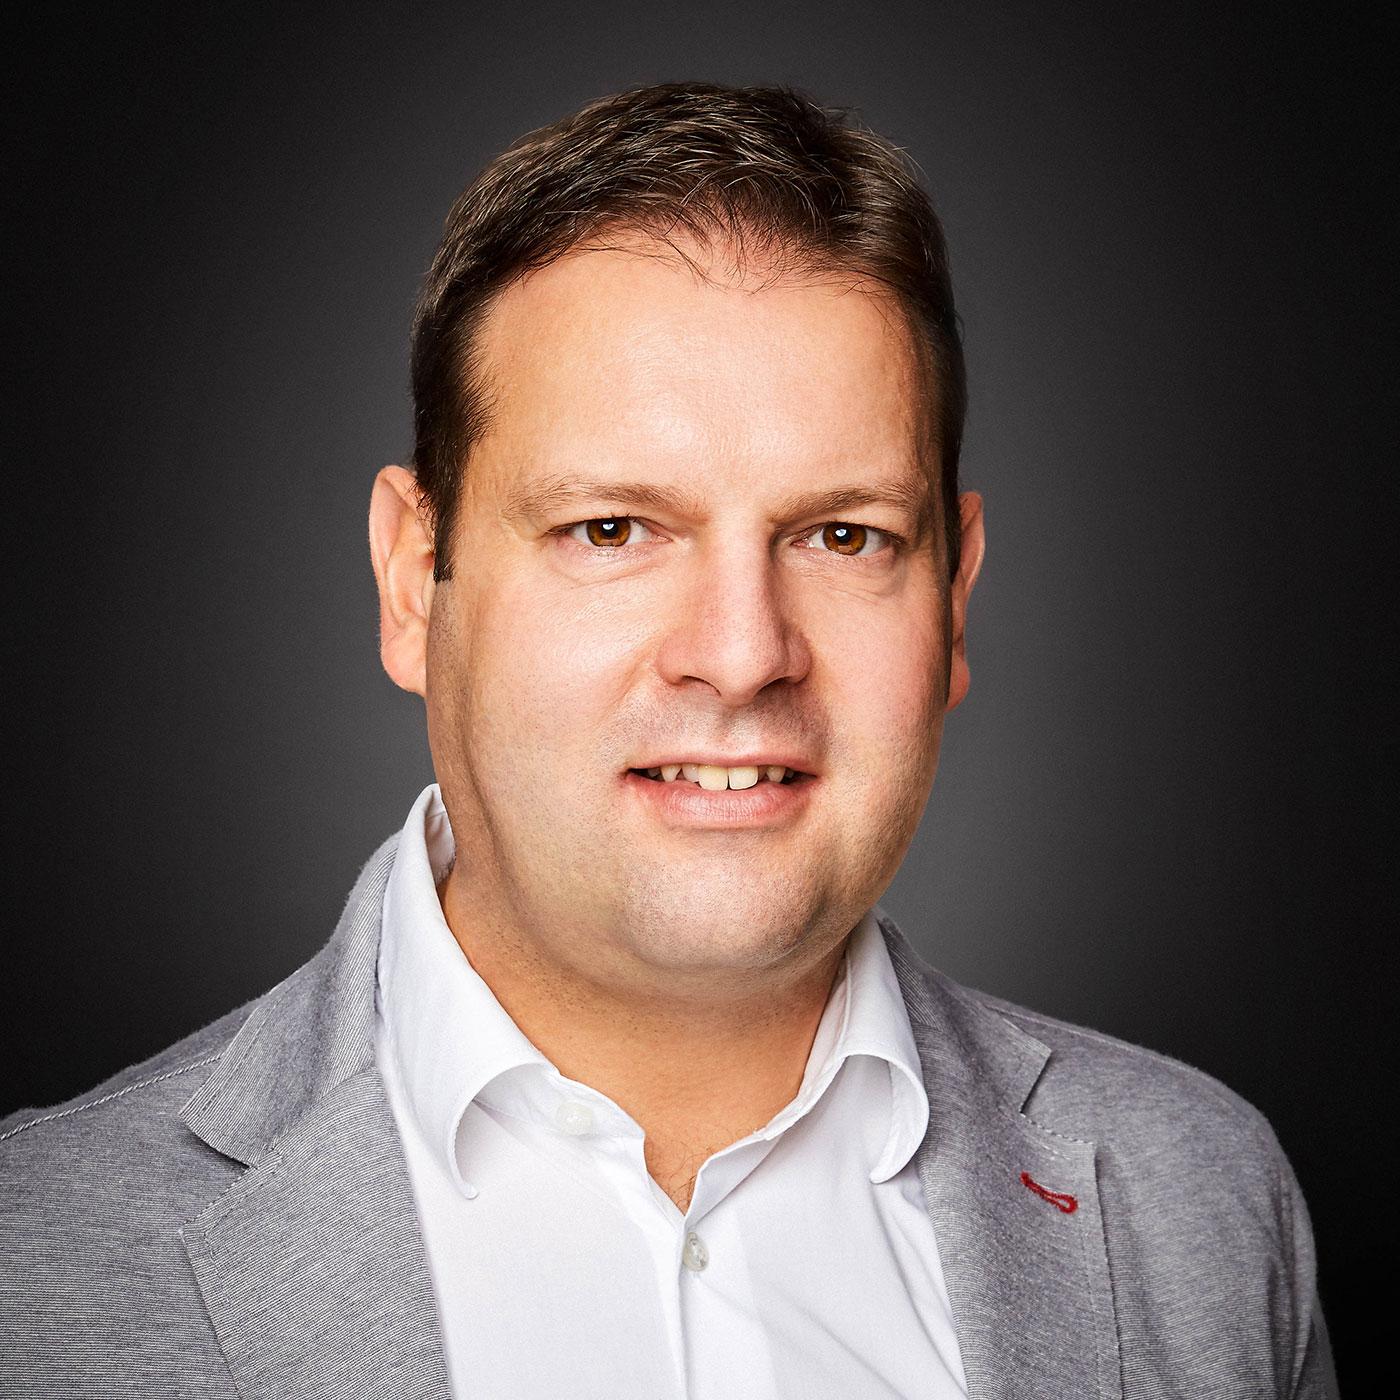 Harald Ganster Stihl TIROL GmbH